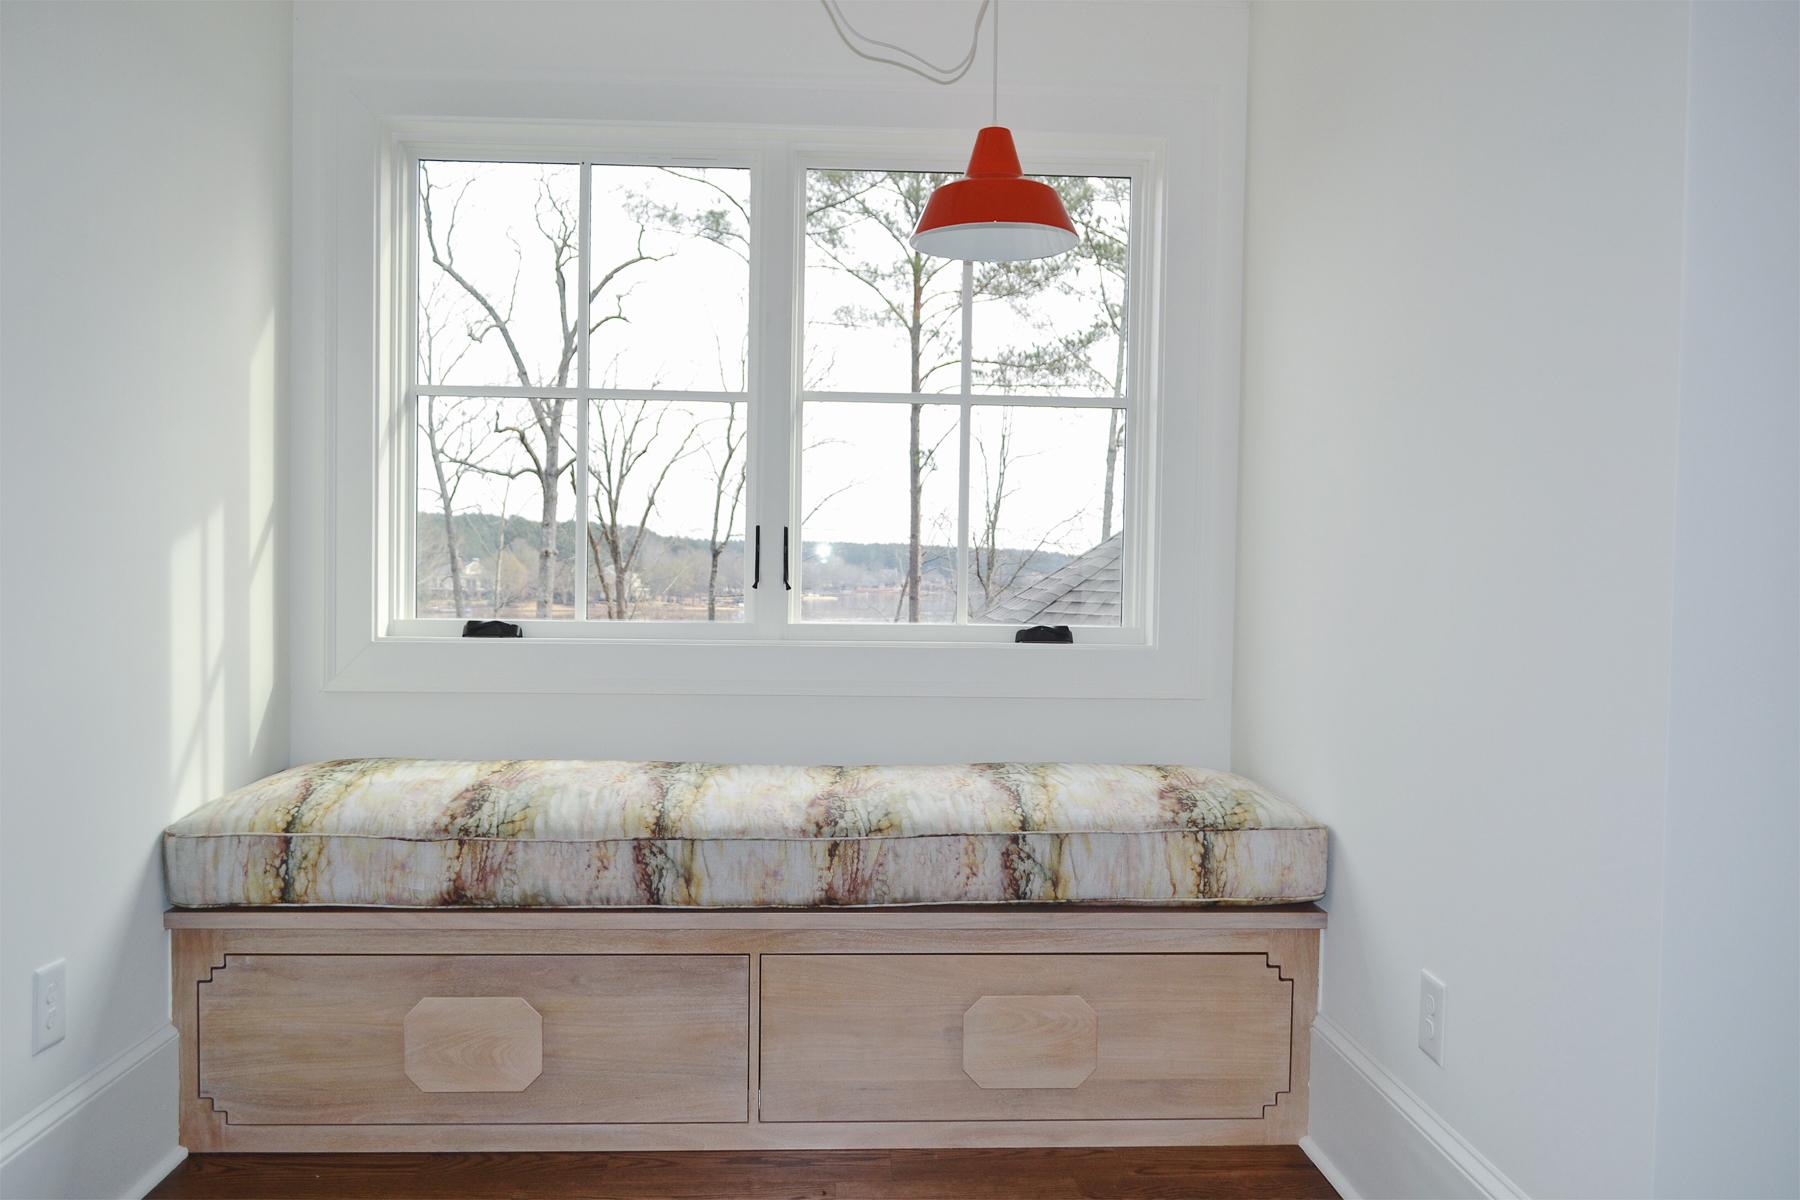 bedroom vintage louis poulsen jab anstoetz fabric_.jpg